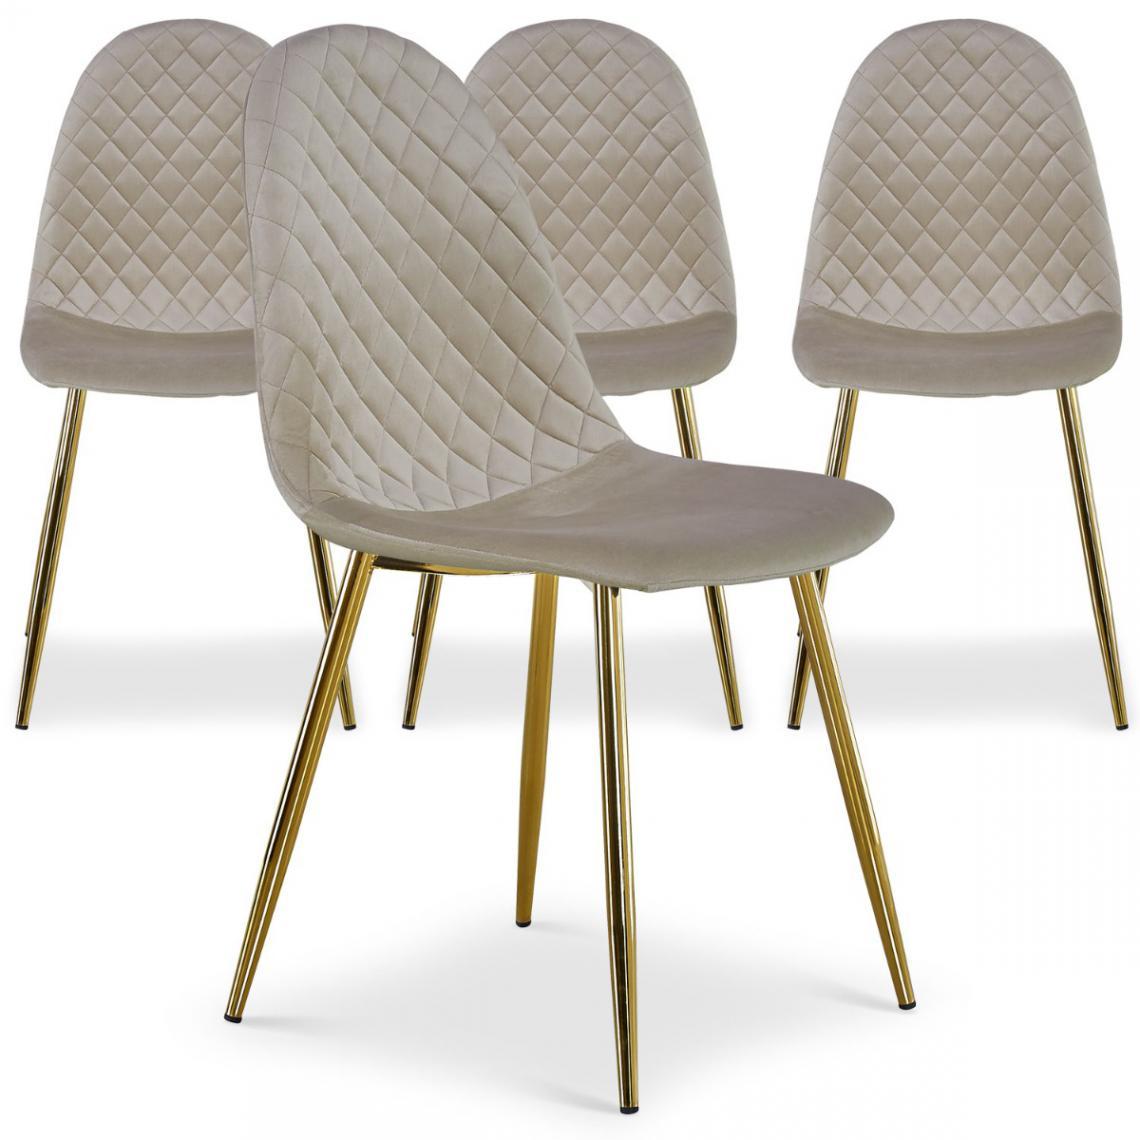 lot de 4 chaises matelassees norway velours taupe